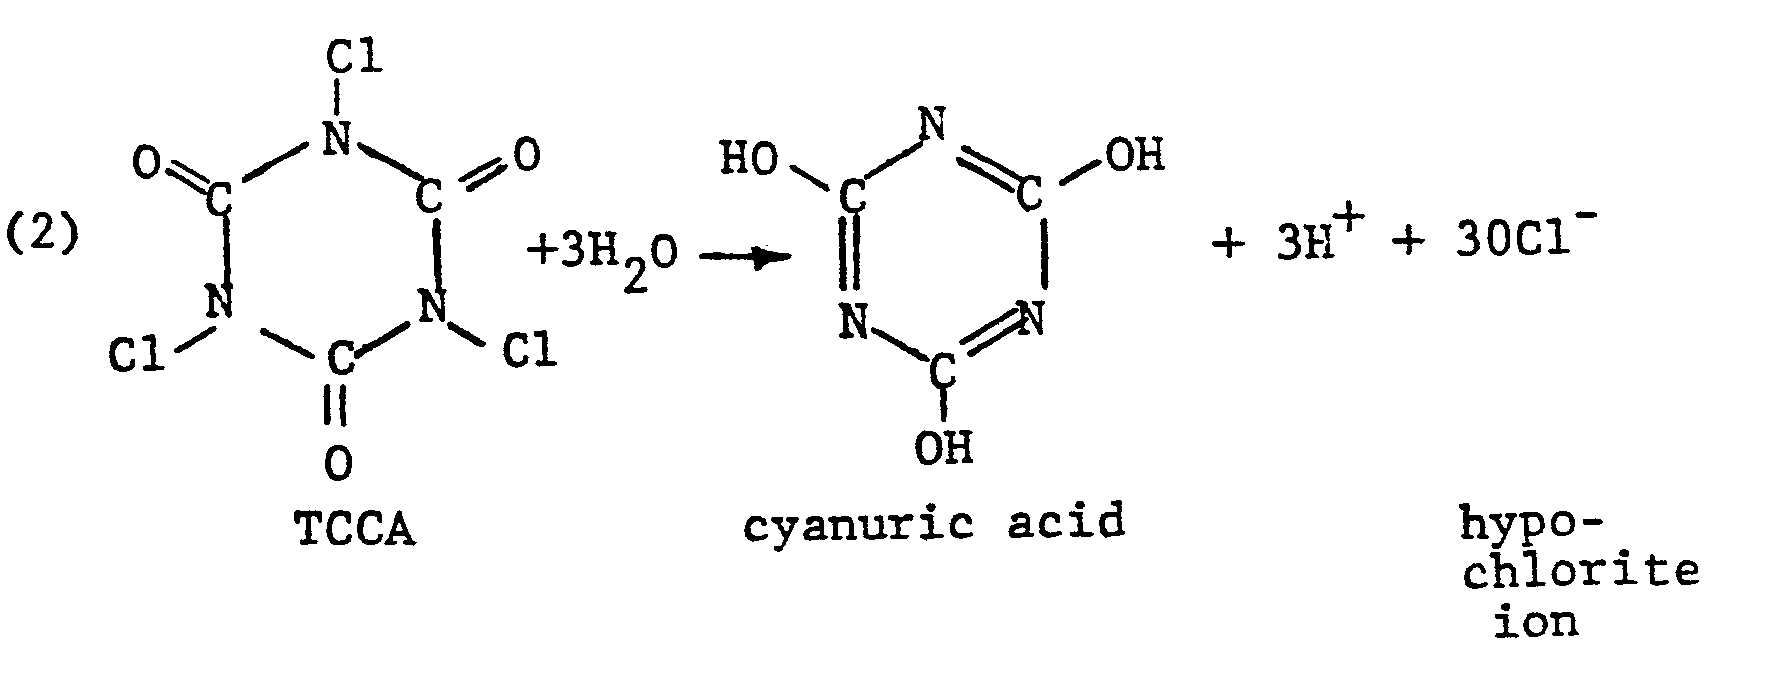 Hypochlorite Ion generates hydrogen ion